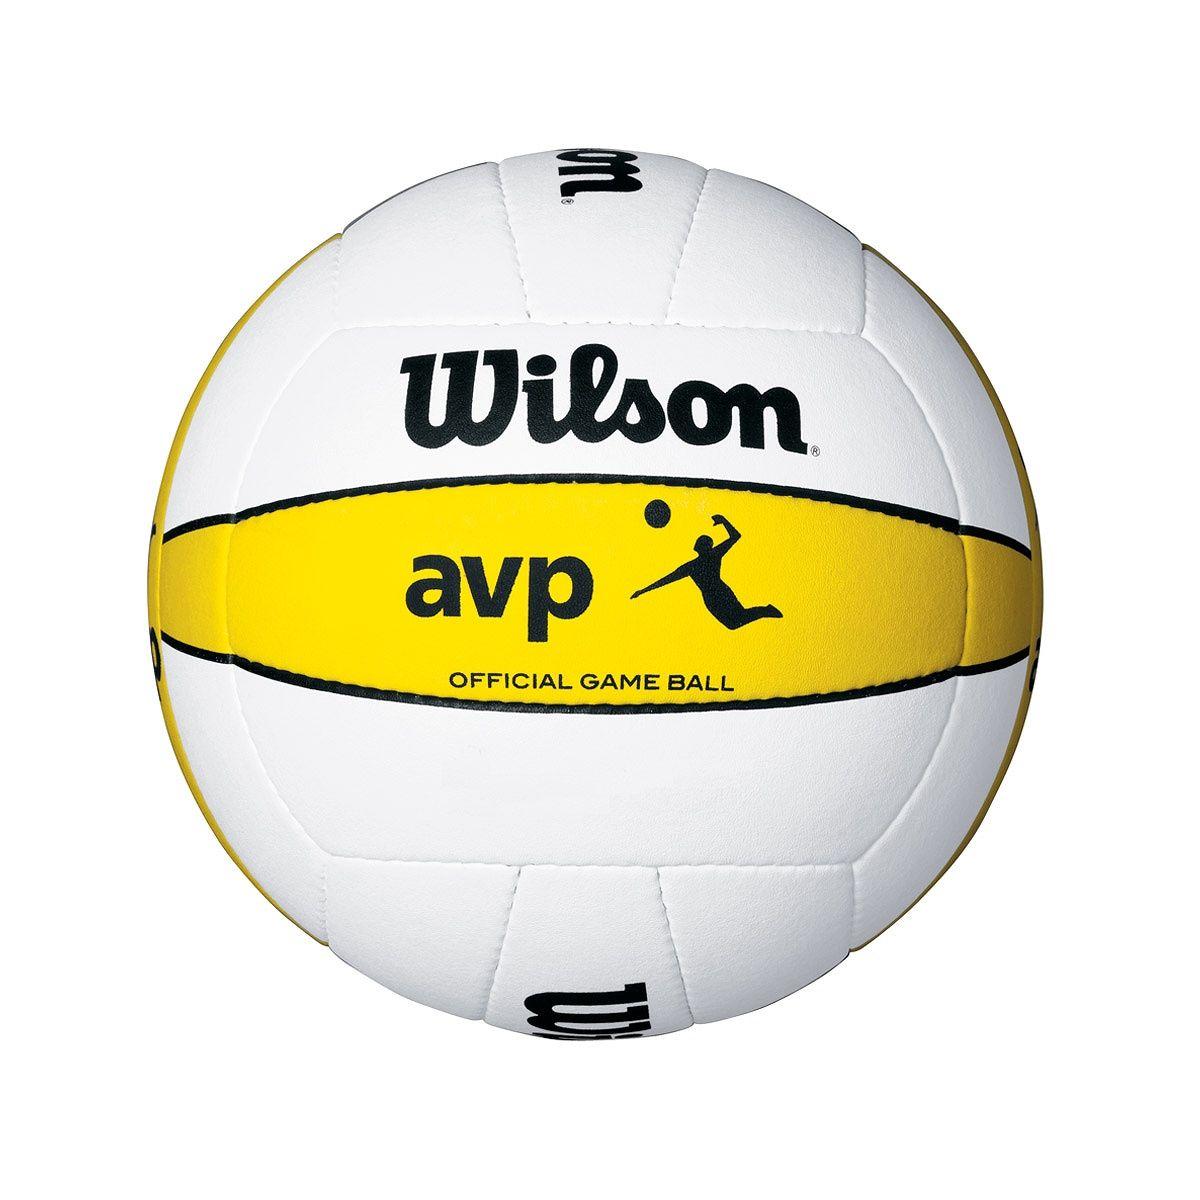 Wilson Avp Game Volleyball Volleyball Volleyball Games Avp Volleyball